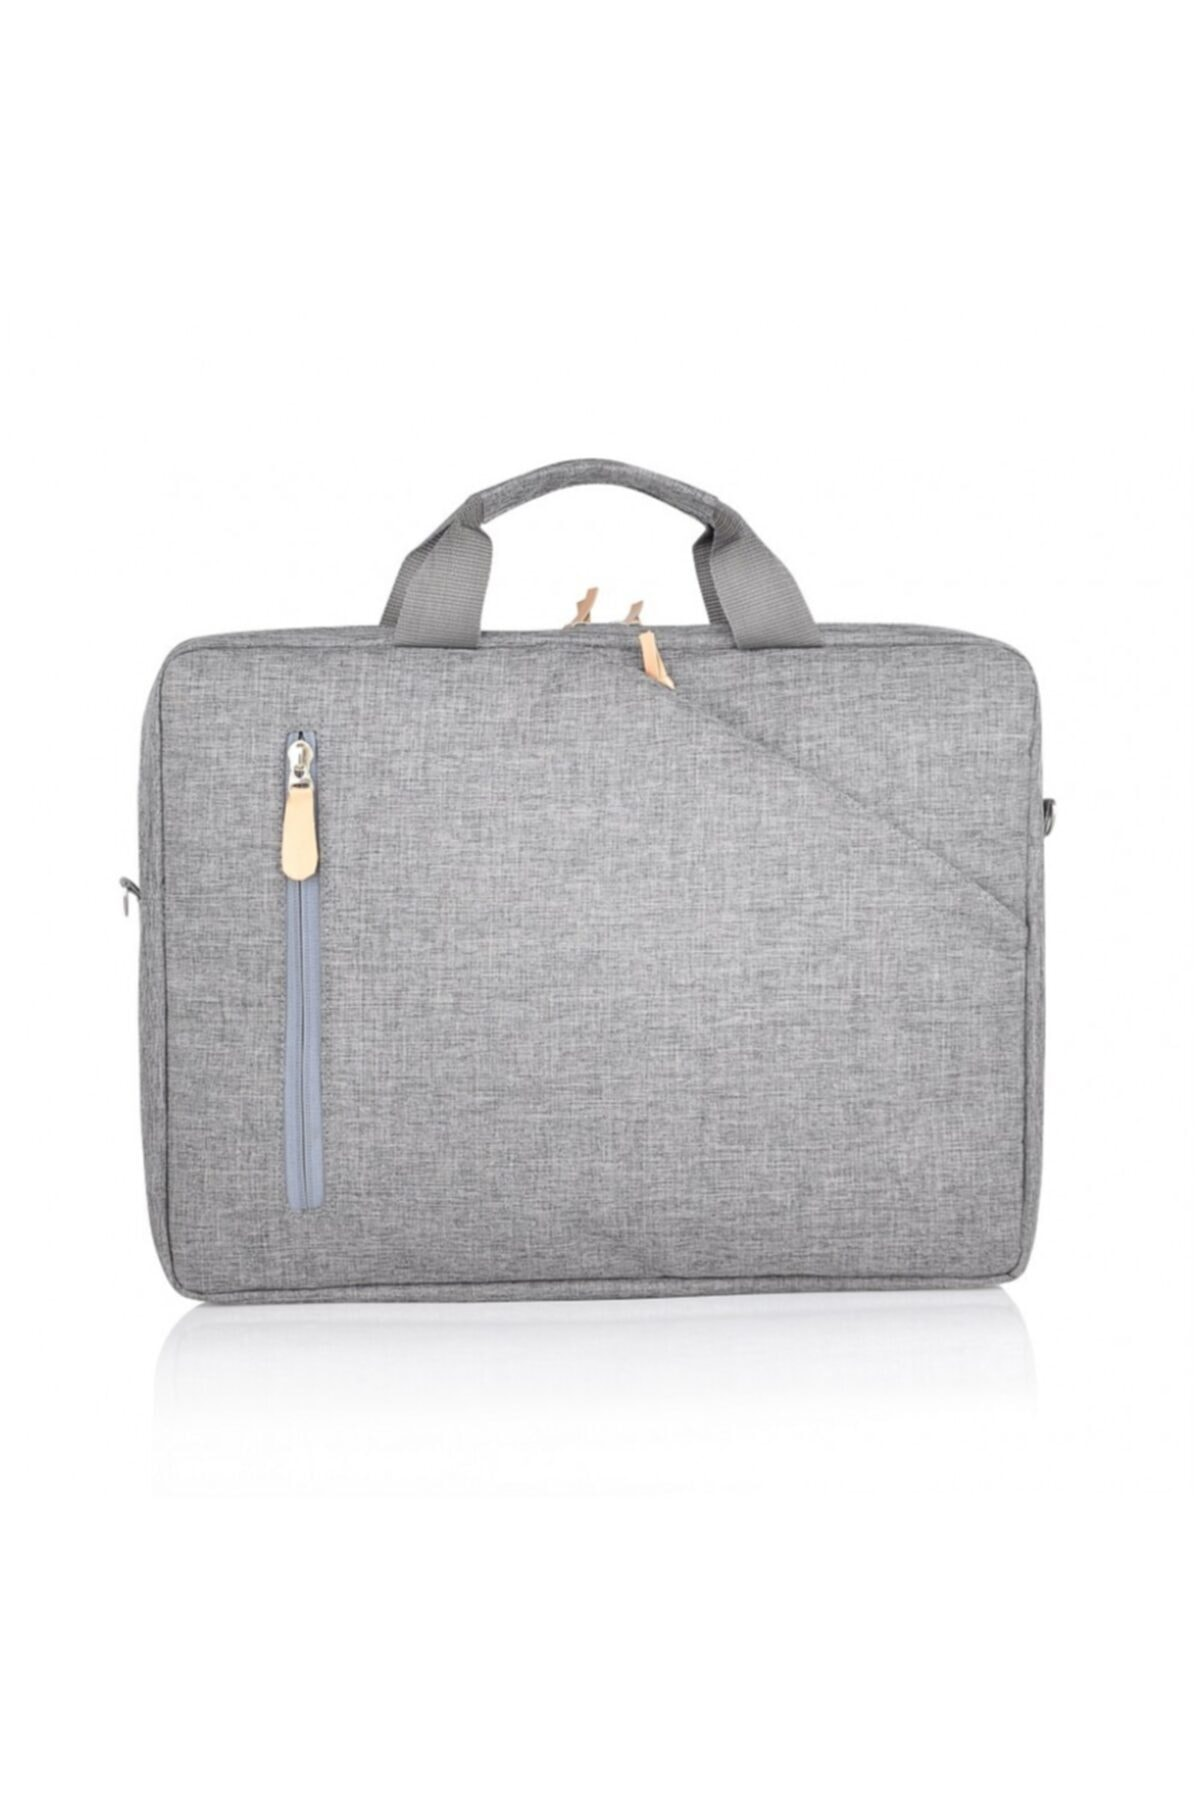 Nar Çanta Laptop / Evrak Çantası Nc-lt-003 Gri (15'' Inç) 2